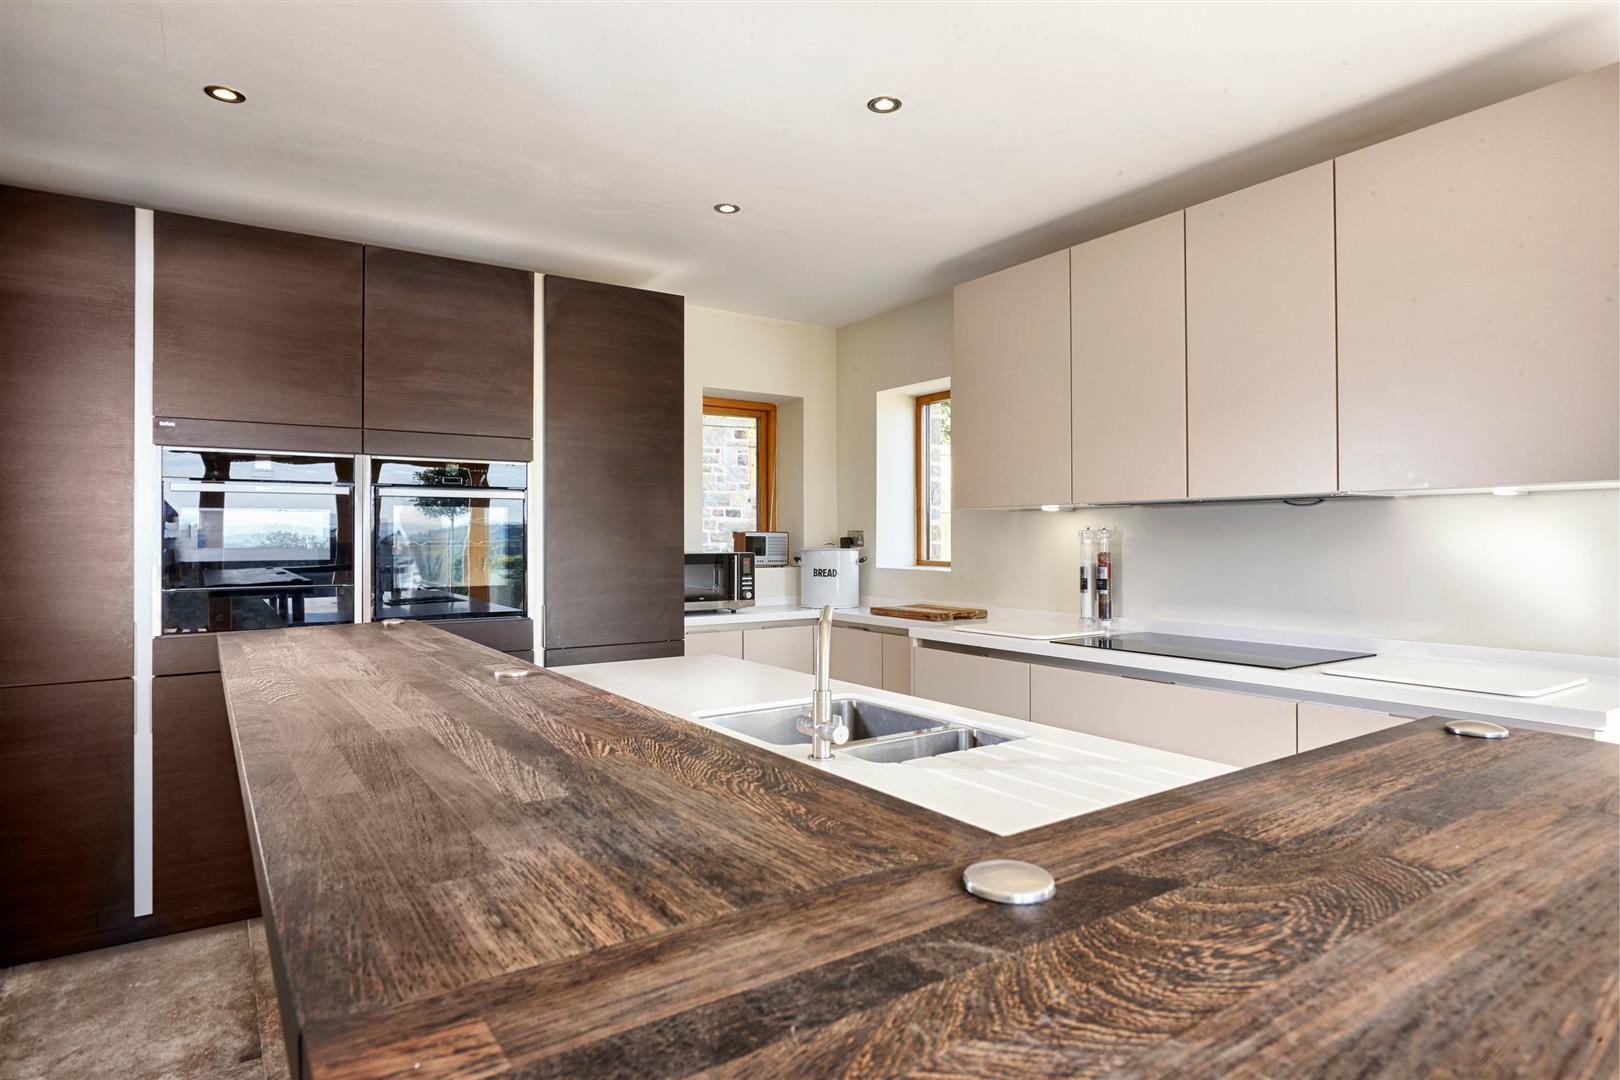 4 Bedroom Detached House For Sale - Farmhouse 4